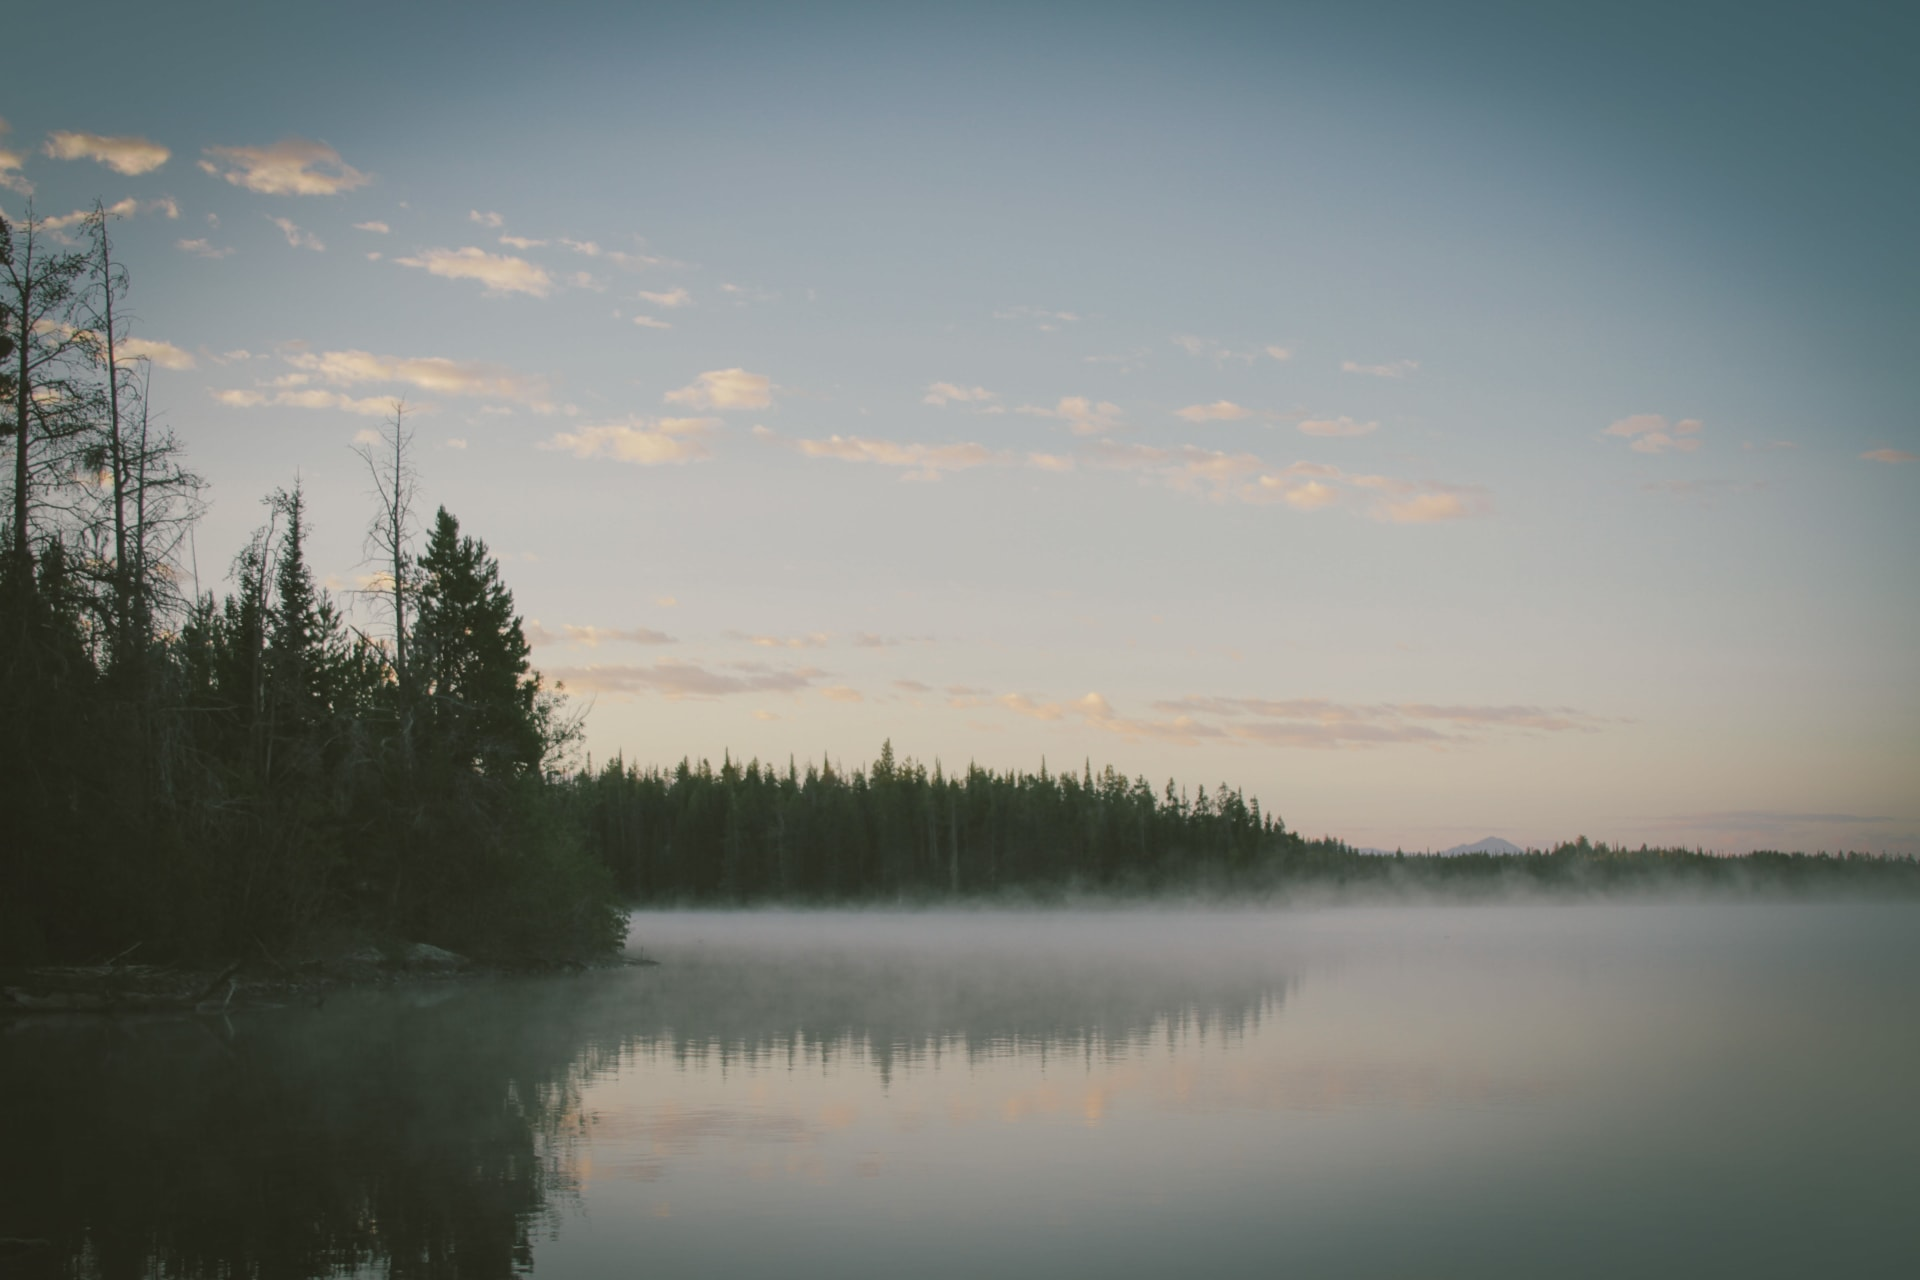 finger lake photo